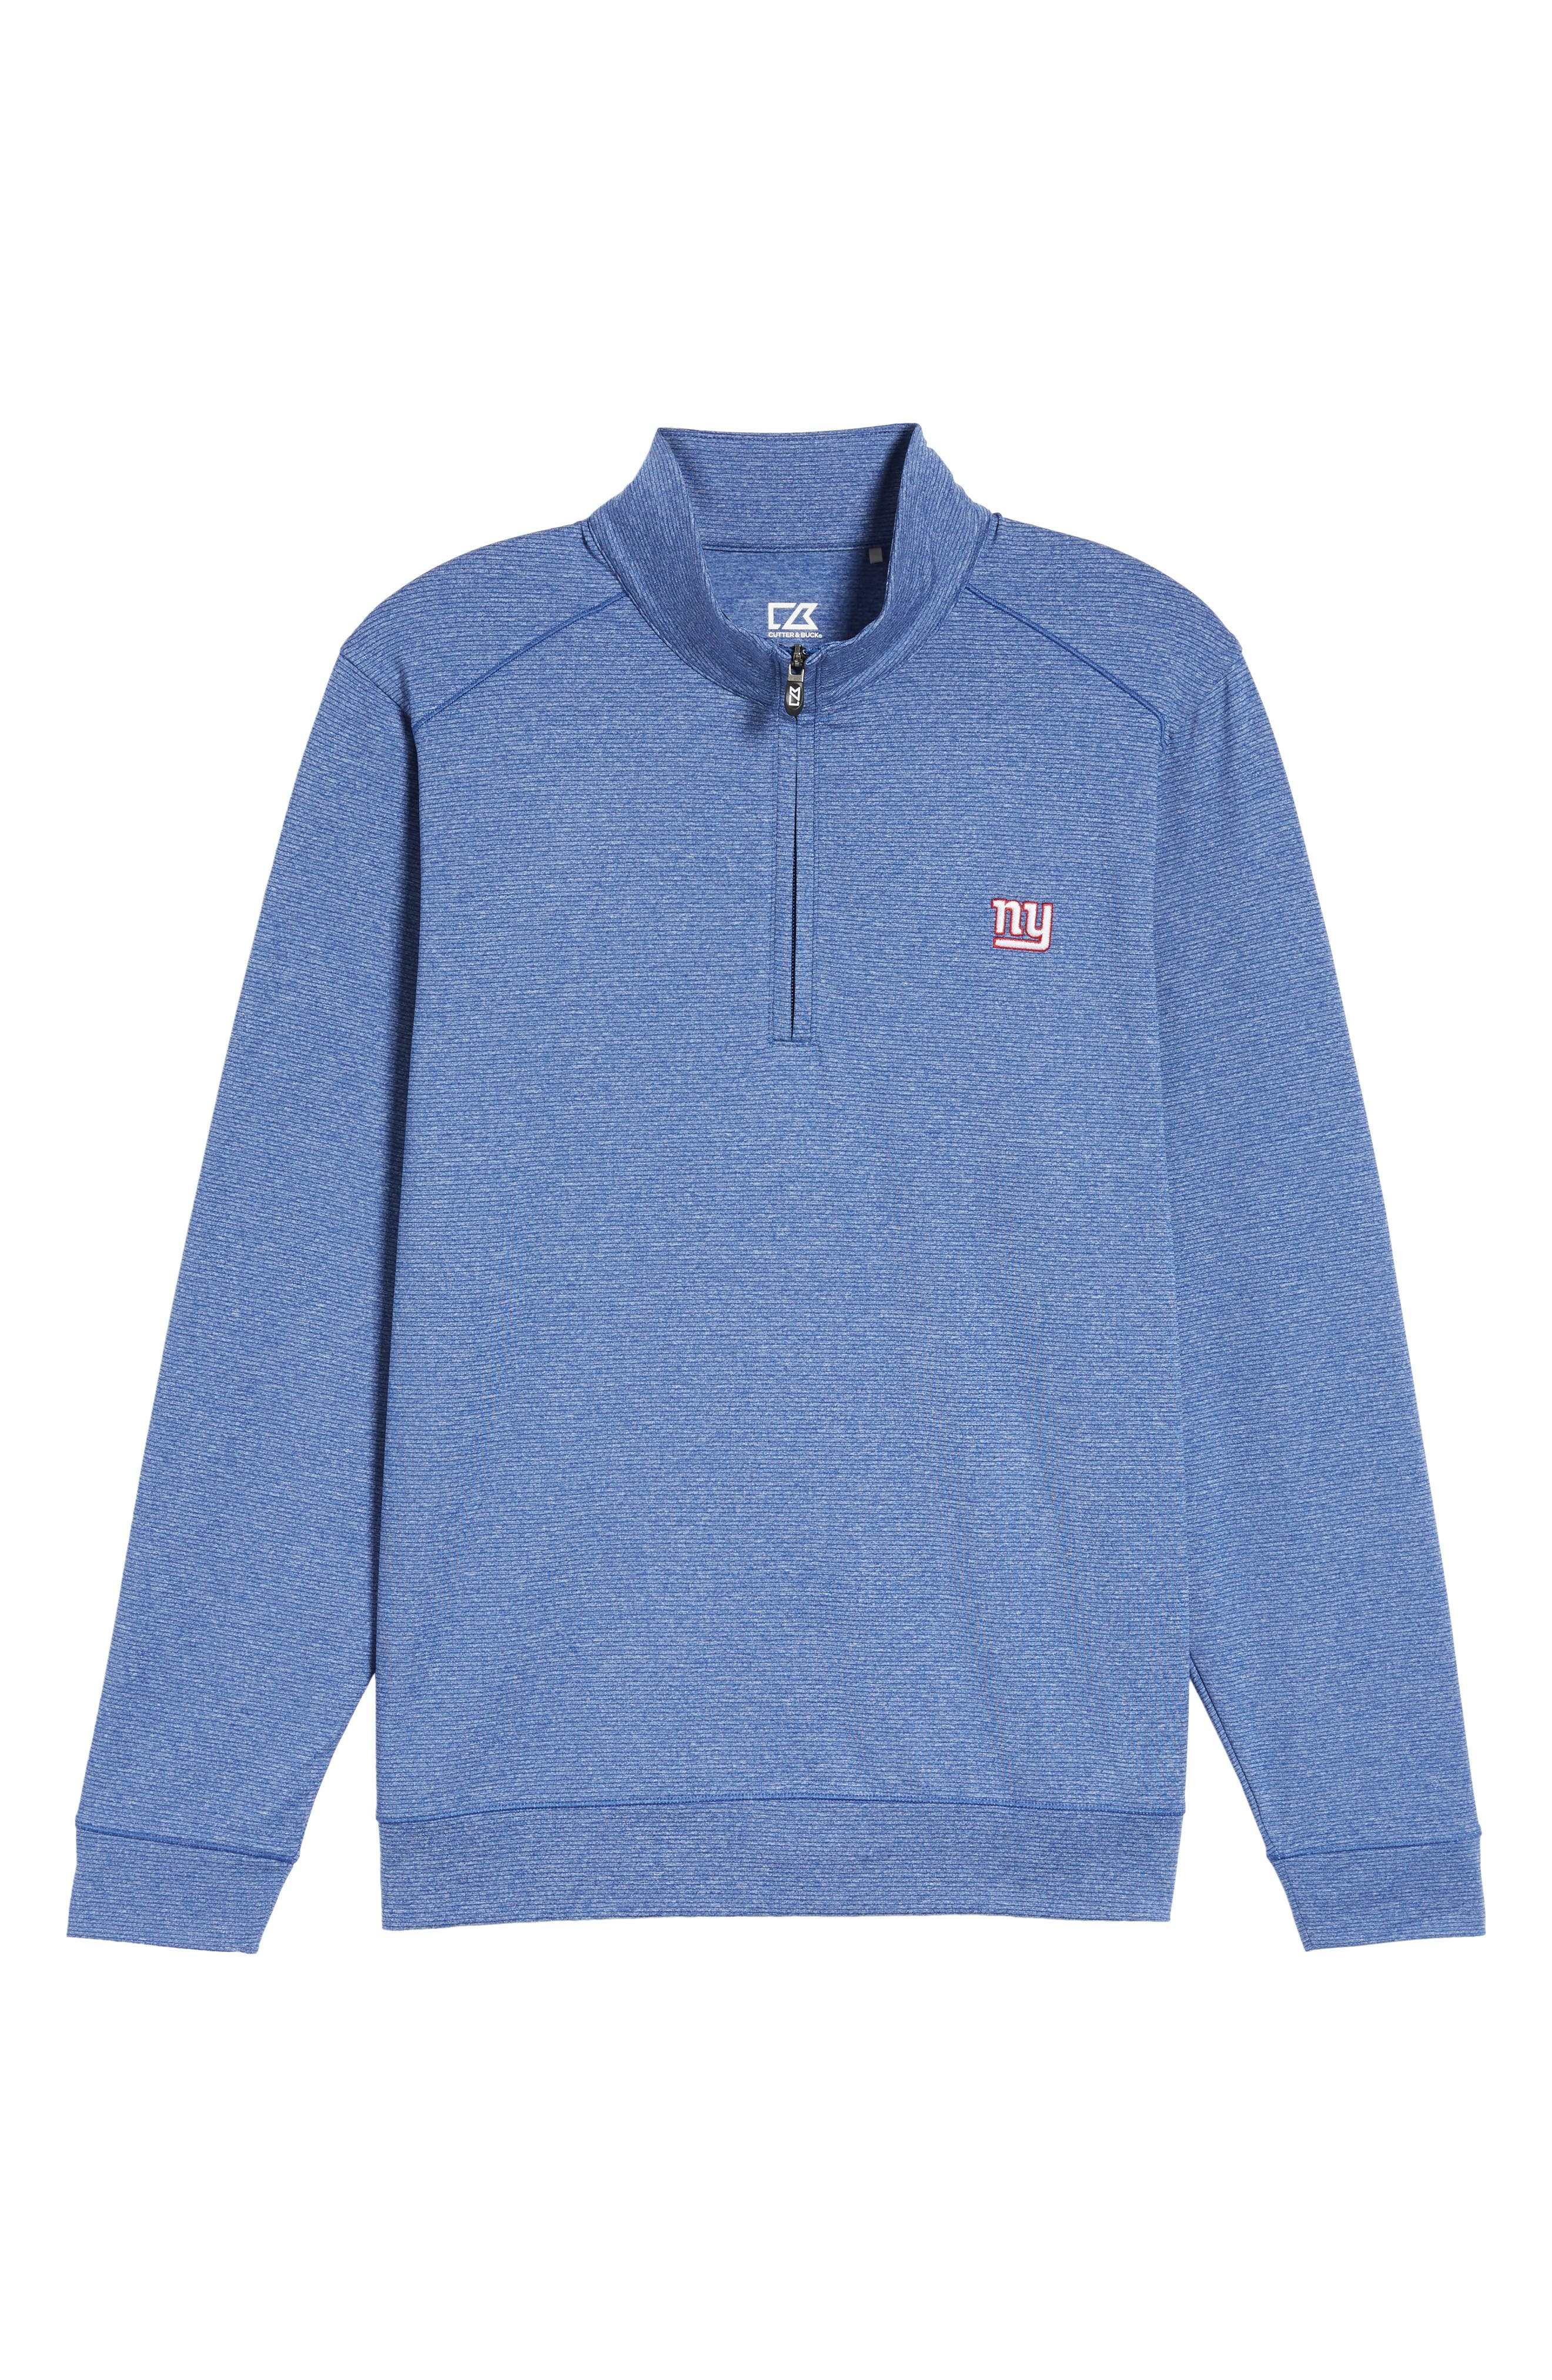 Shoreline - New York Giants Half Zip Pullover,                             Alternate thumbnail 6, color,                             425